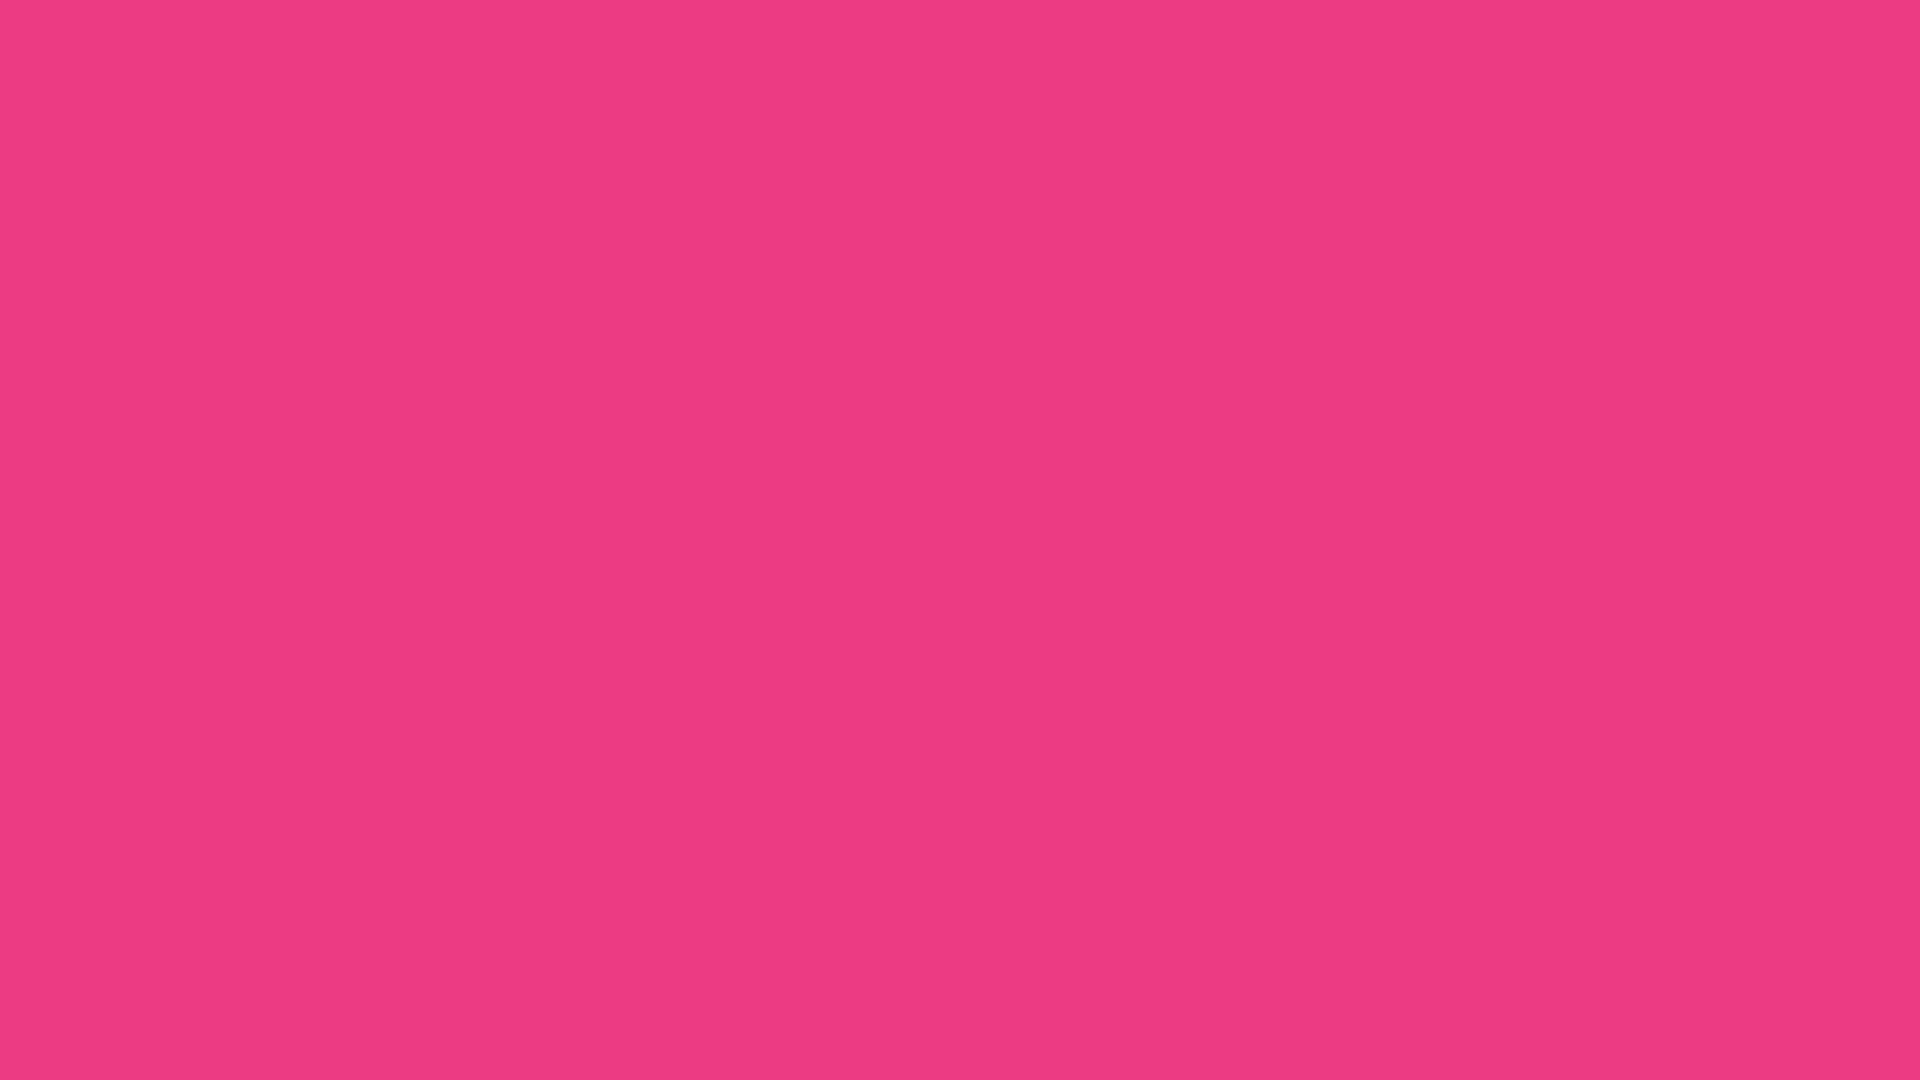 1920x1080 Cerise Pink Solid Color Background